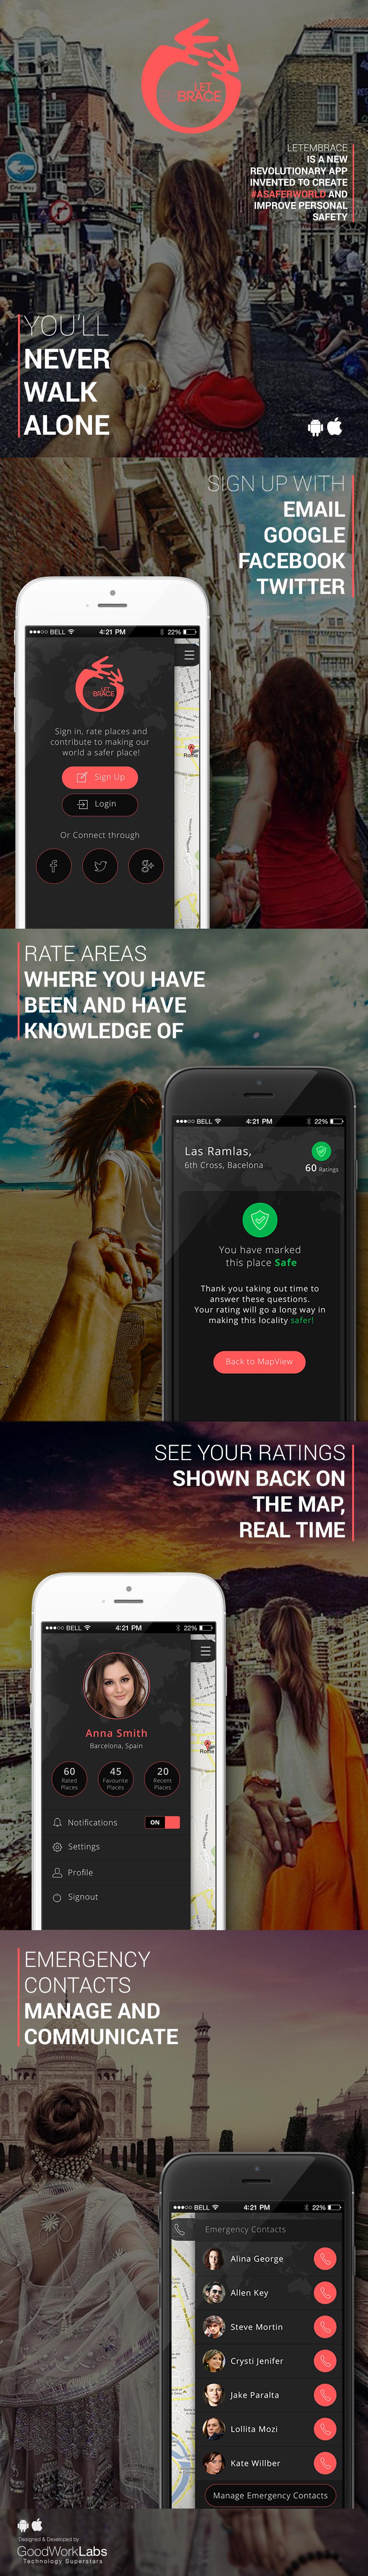 LetEmbrace-social-safety-mobile-app-GoodWorkLabs